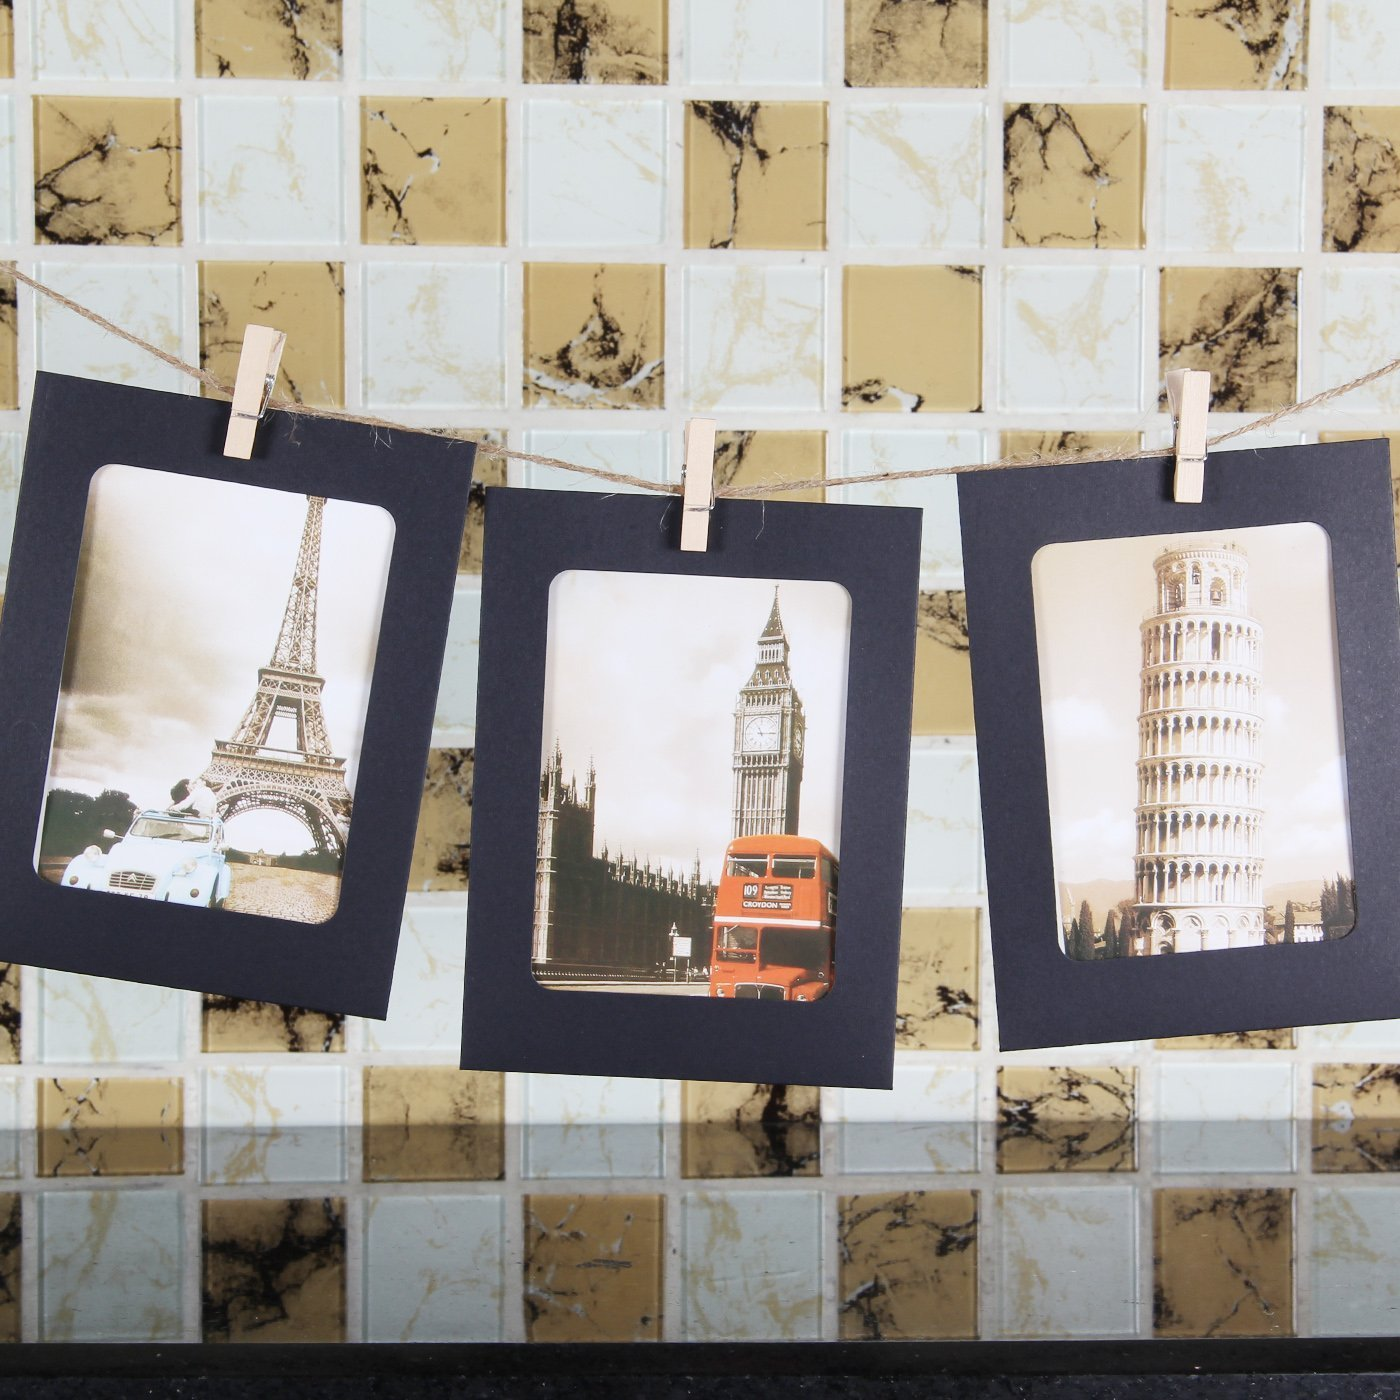 NOBBEE Paper Frame 4x6 Kraft Paper Picture Frames 30 PCS DIY